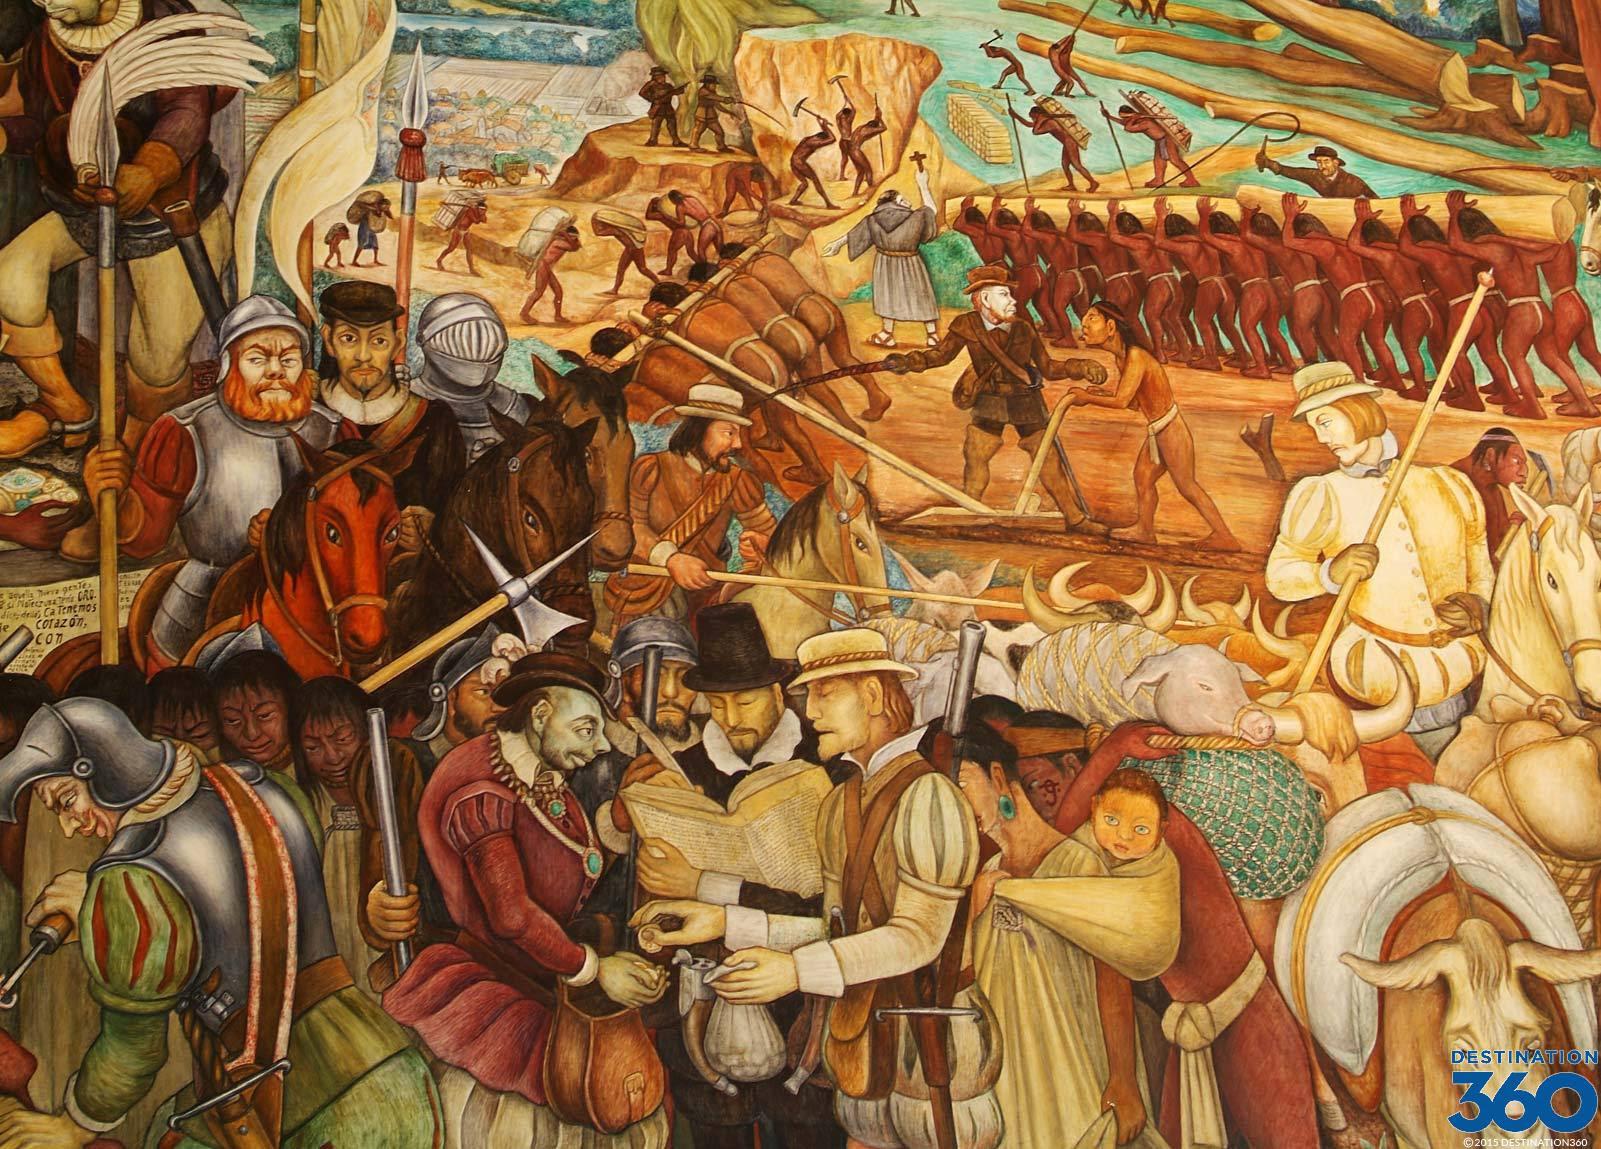 Palacio Nacional Mural Diego Rivera Mural In Mexico City